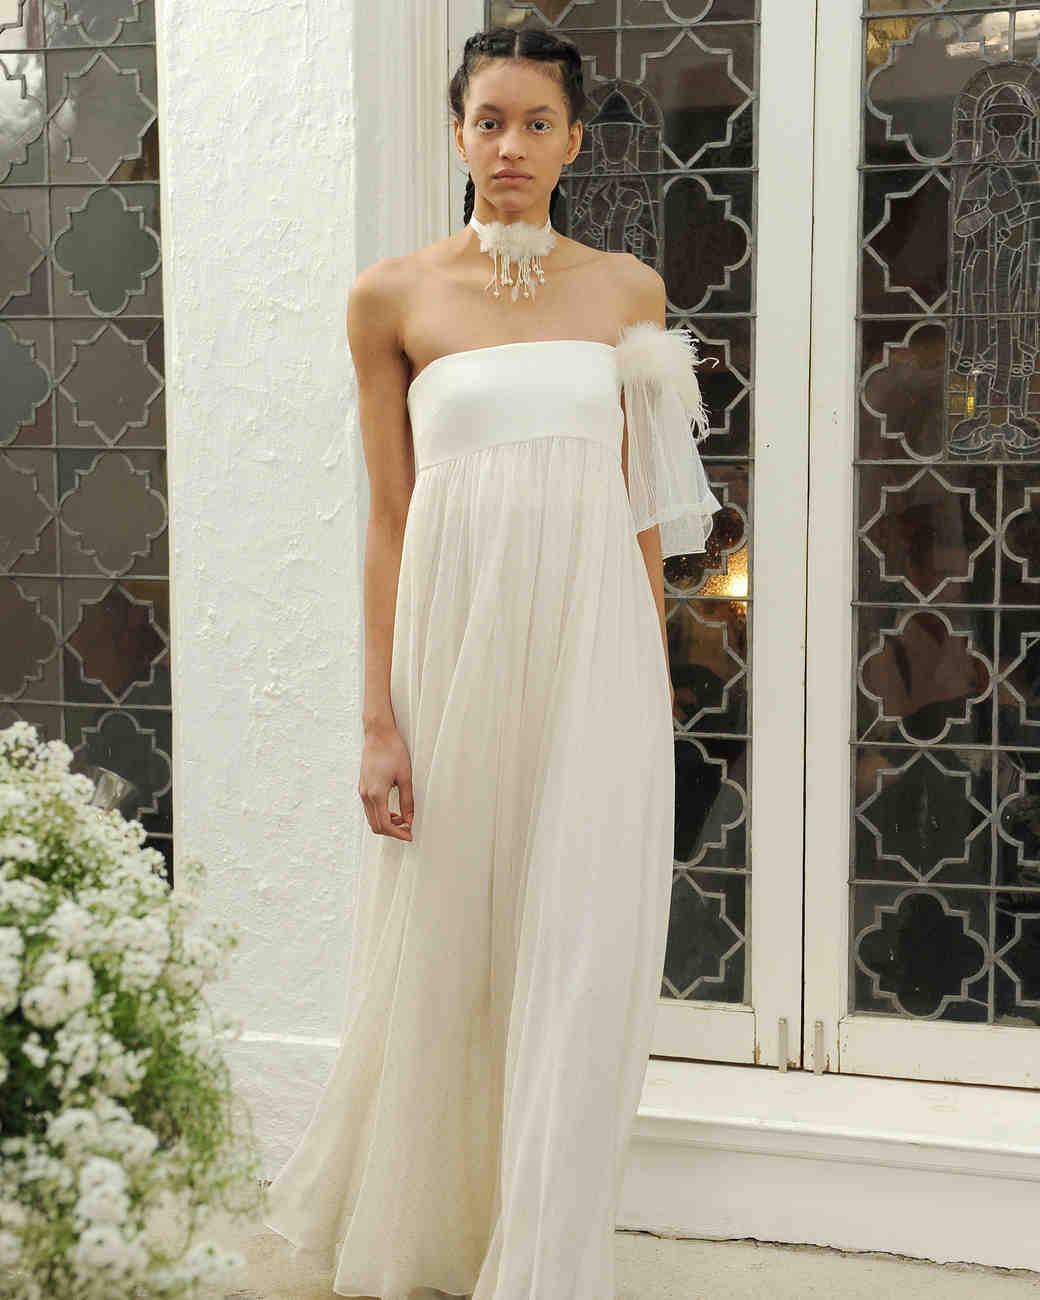 Houghton ivory and metallic strapless wedding dress